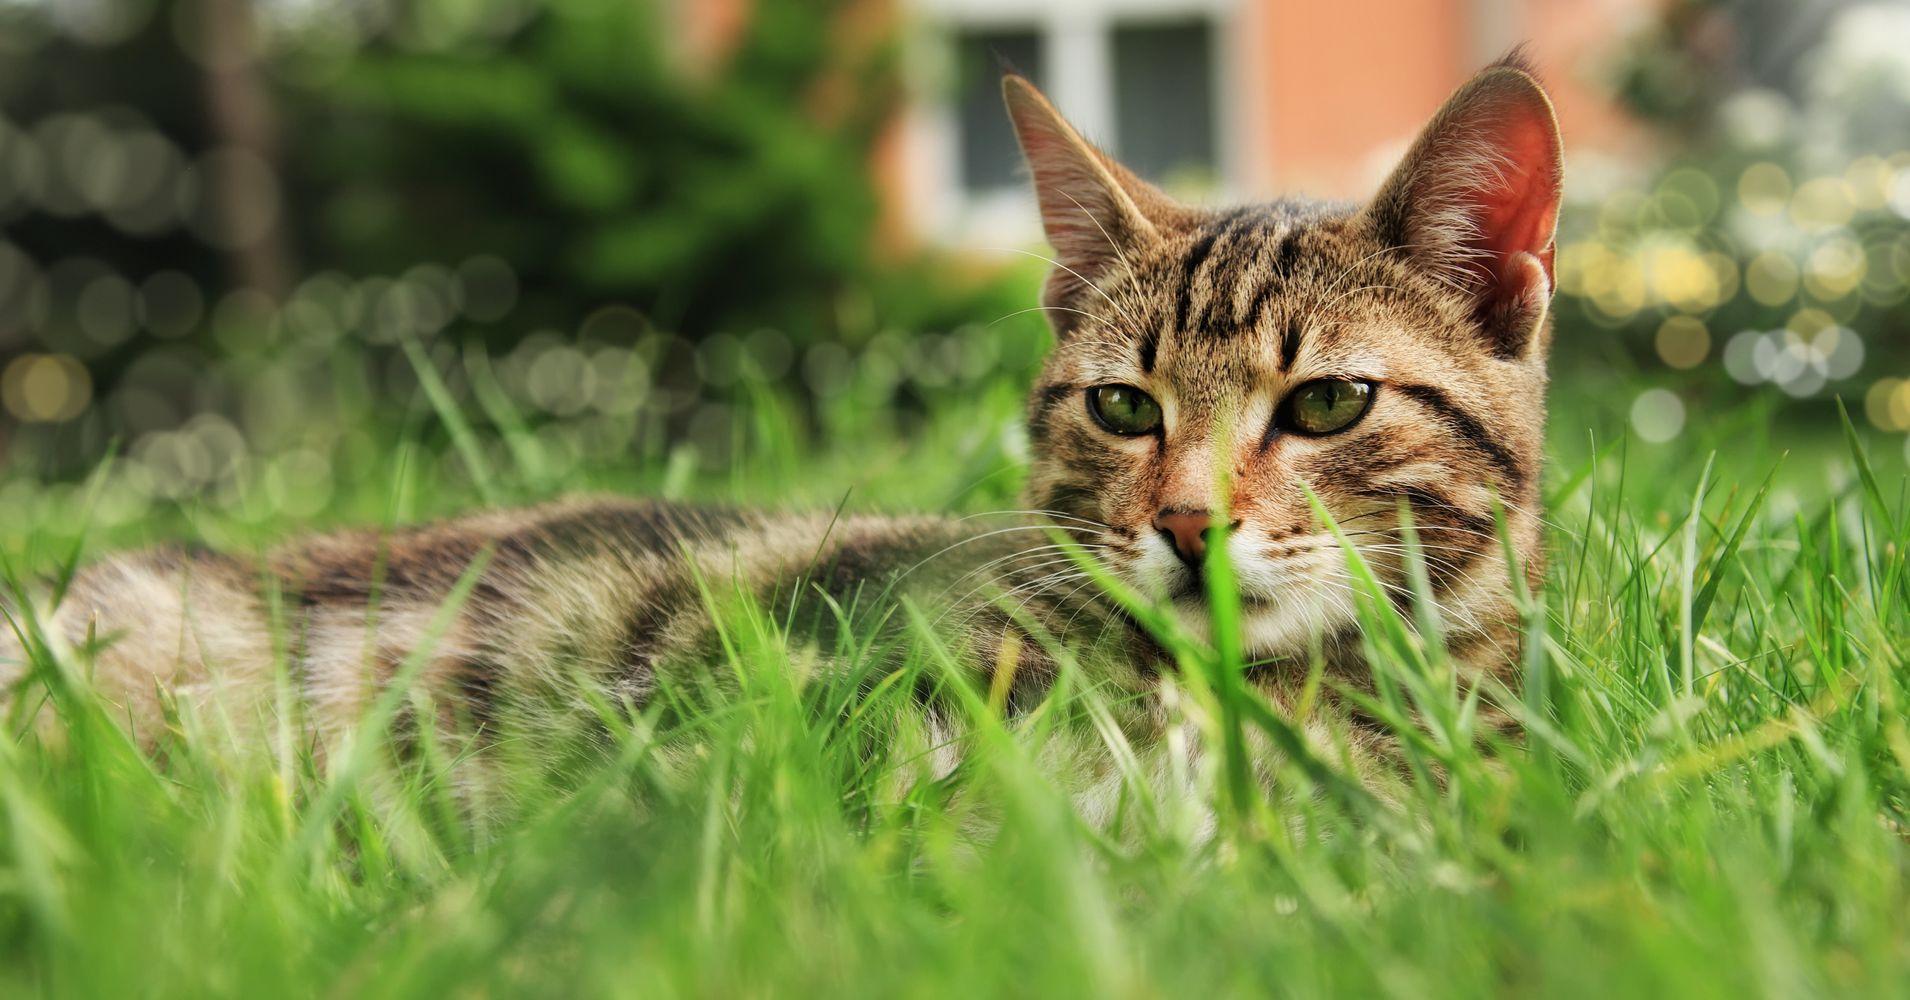 This New Zealand Village May Ban Cats | HuffPost